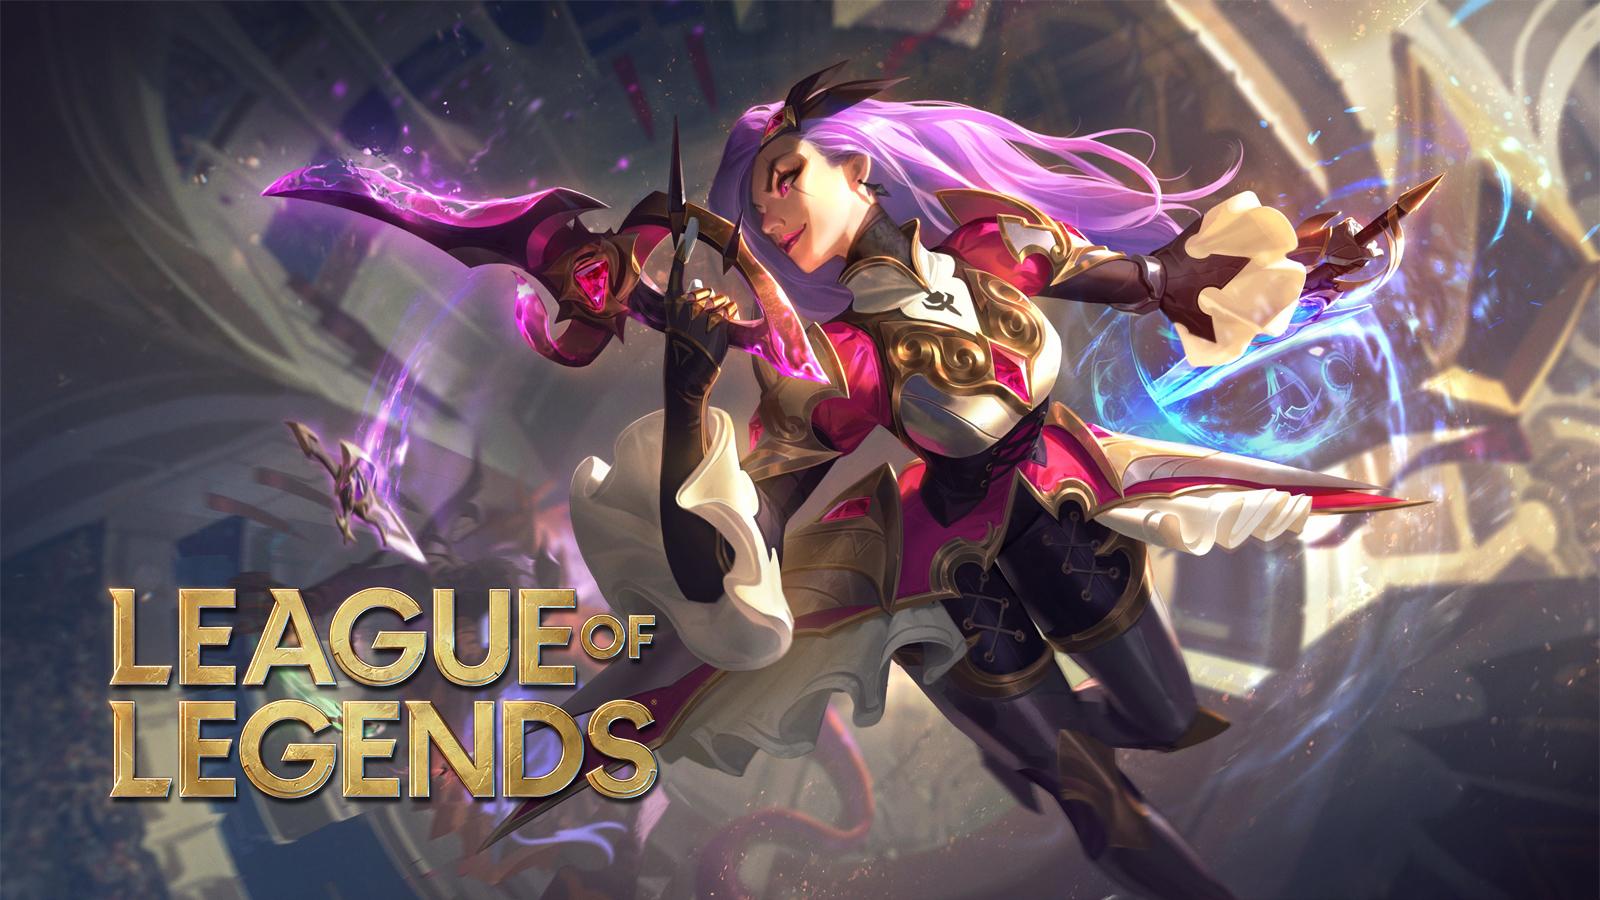 Battle Queen Katarina in League of Legends